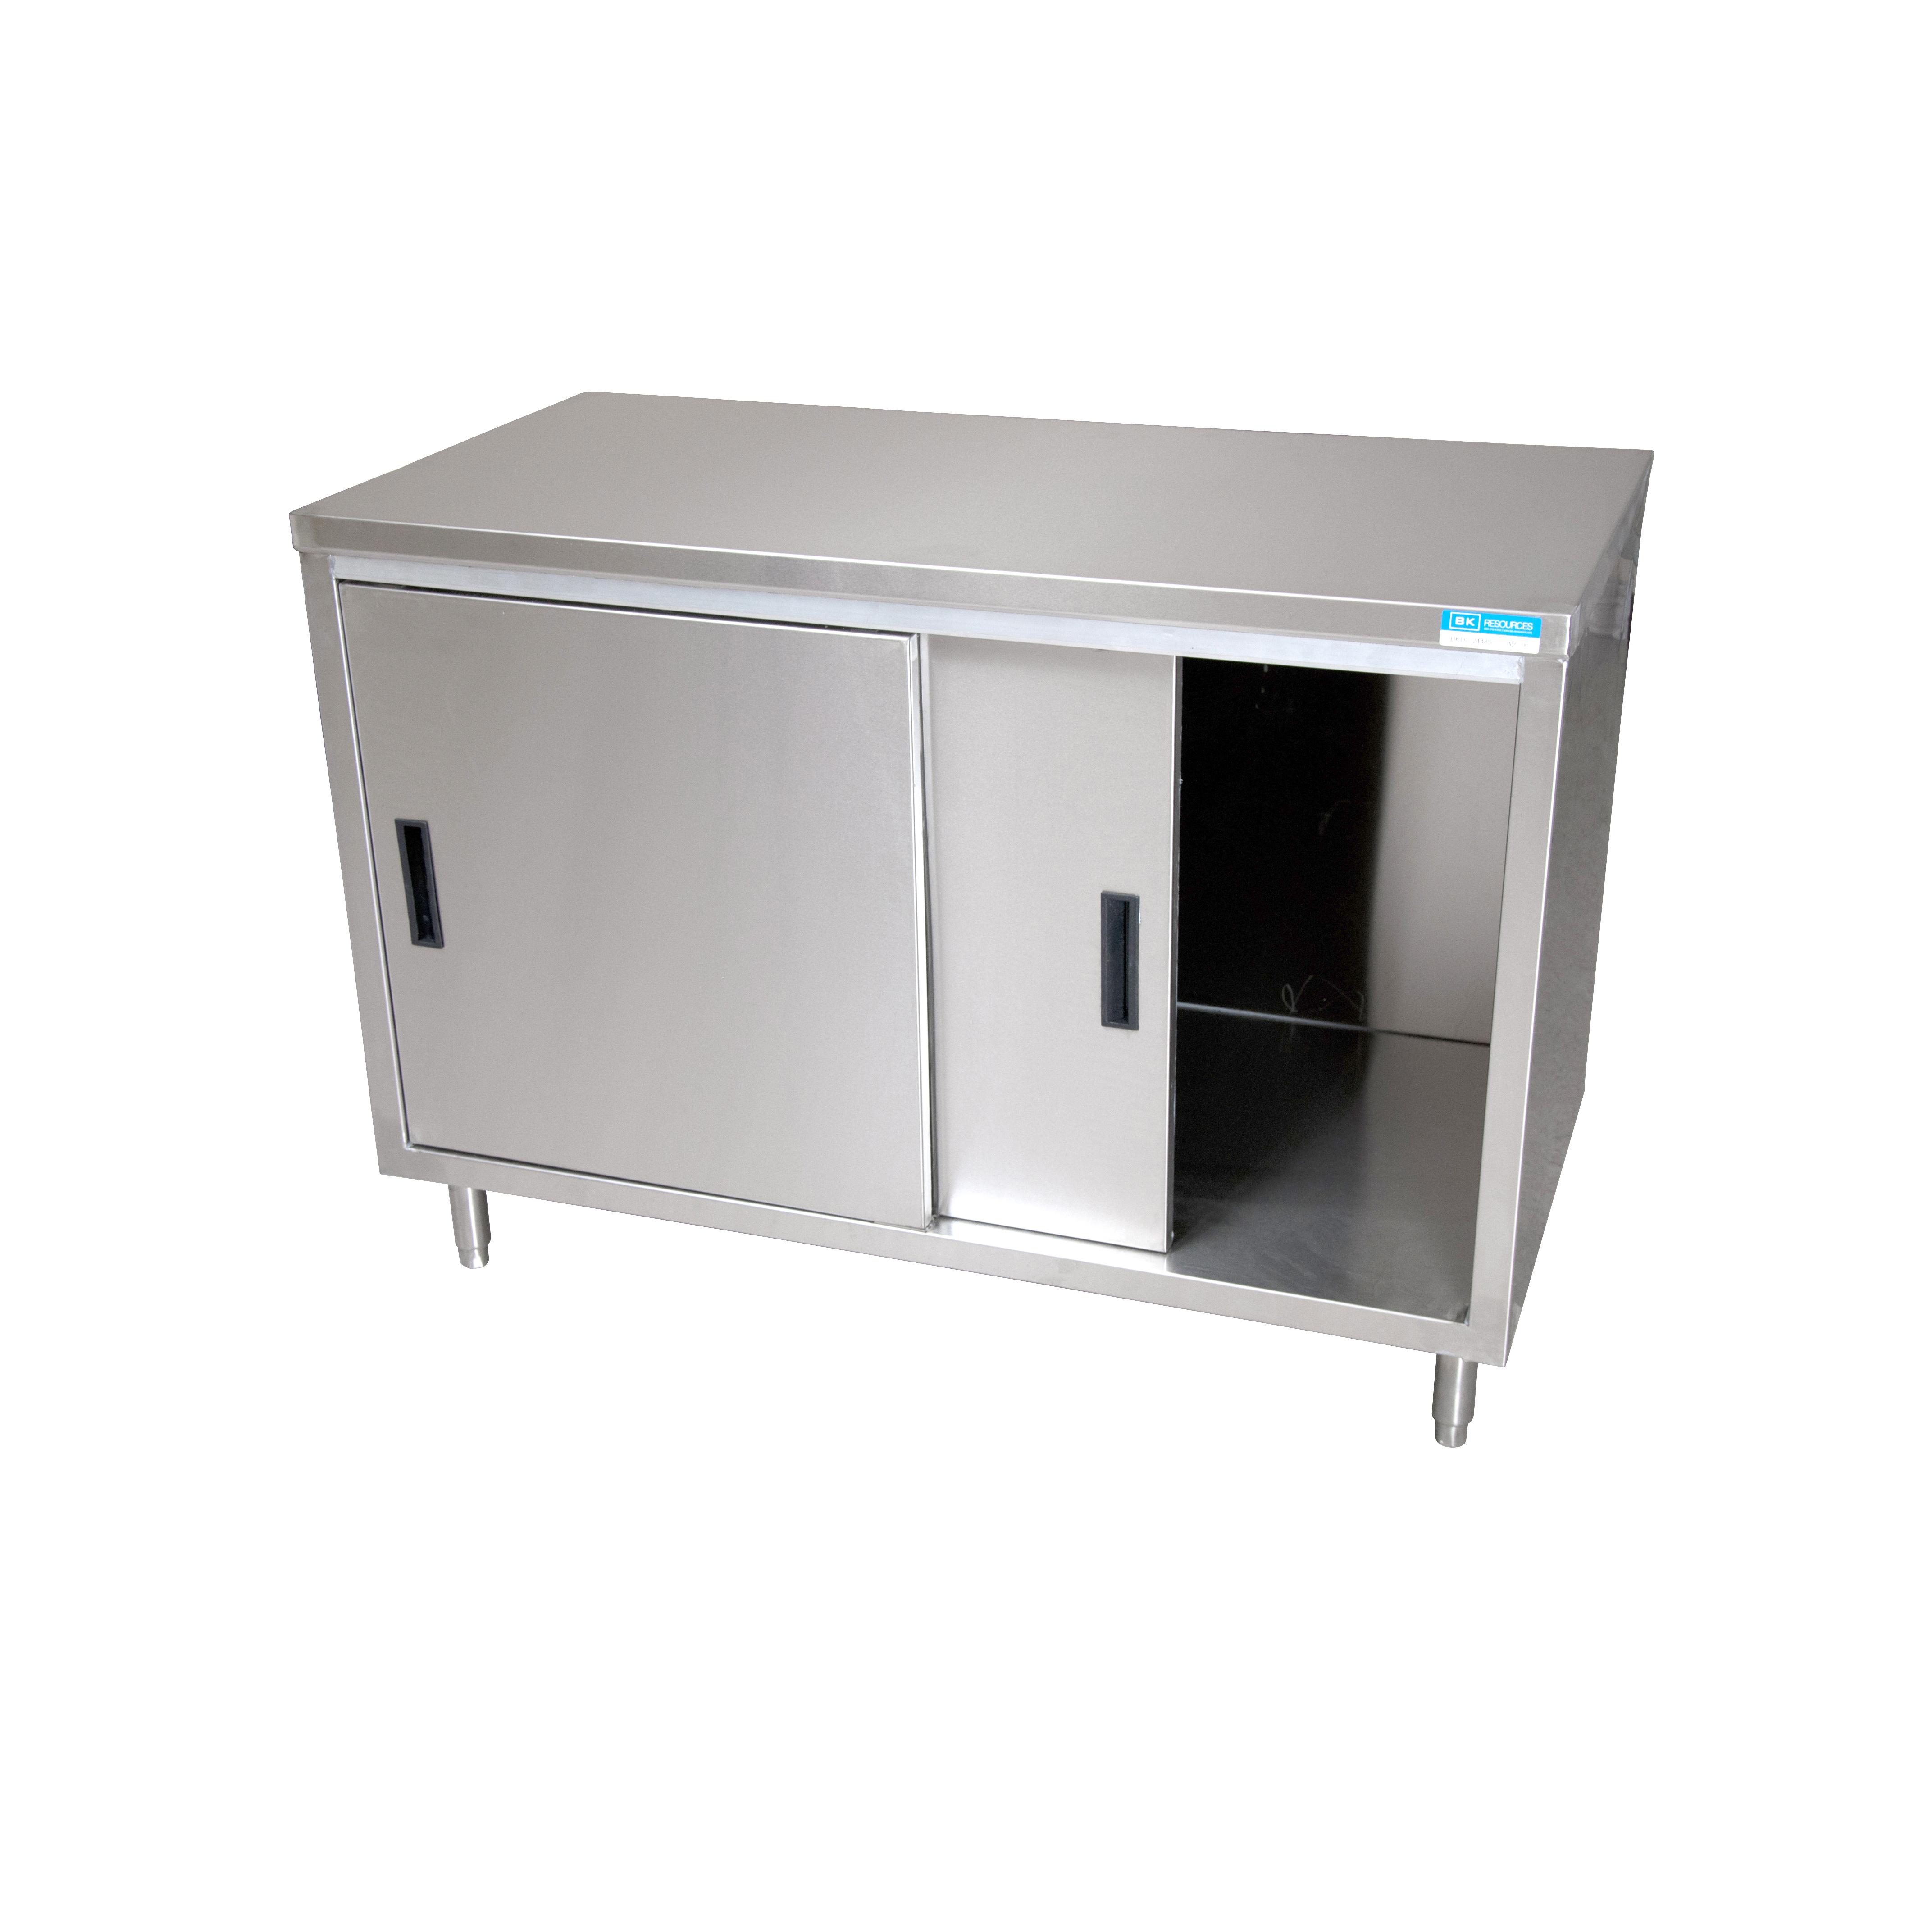 BK Resources BKDC-2460S work table, cabinet base sliding doors